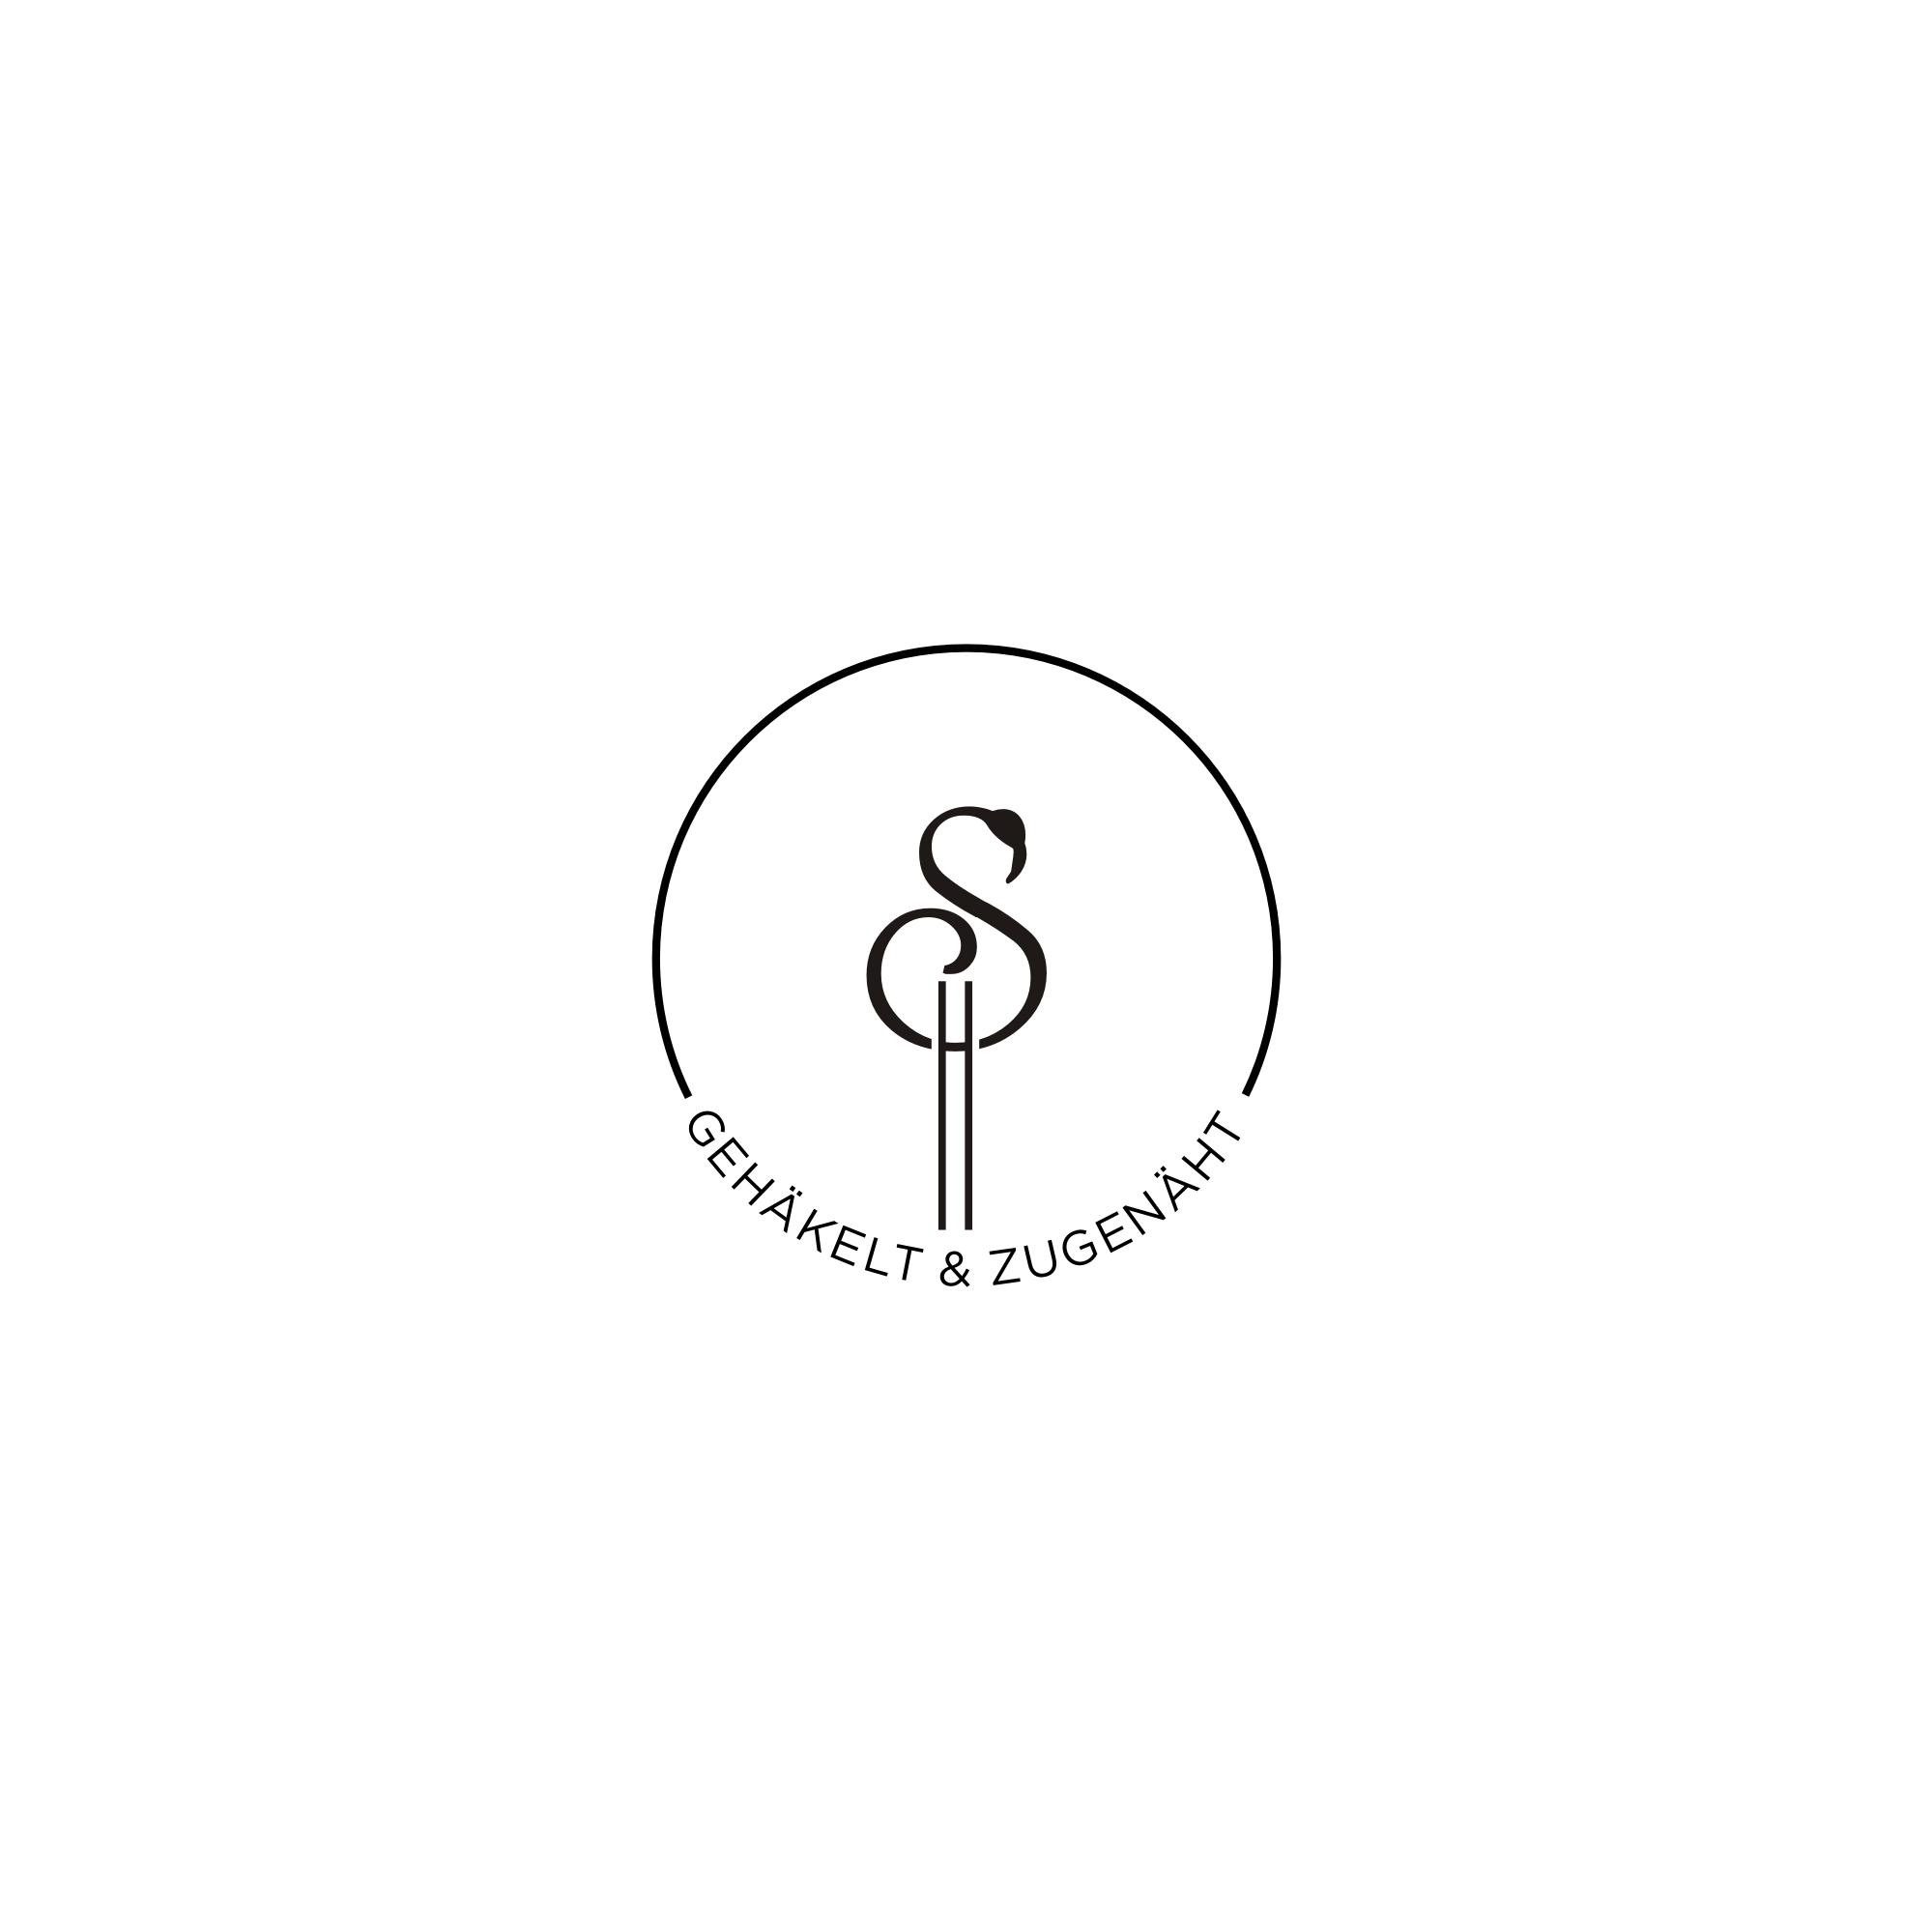 design #160 of Naya